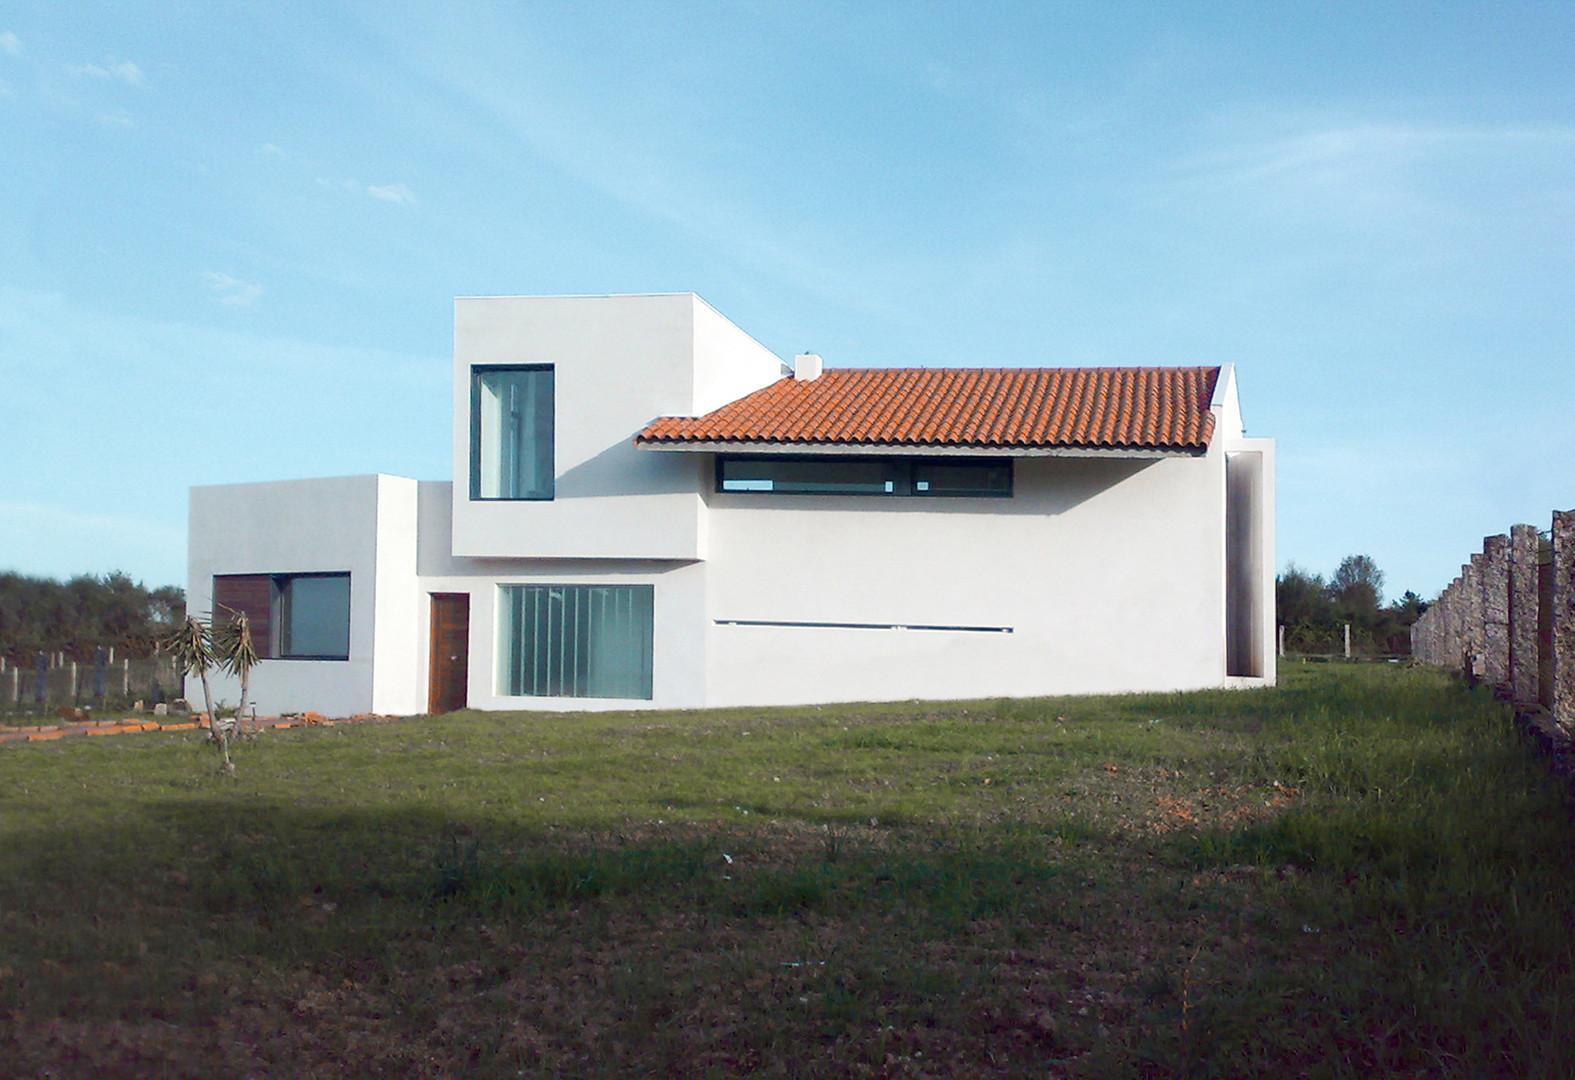 arquitectura-senmais-06.24.02.jpg